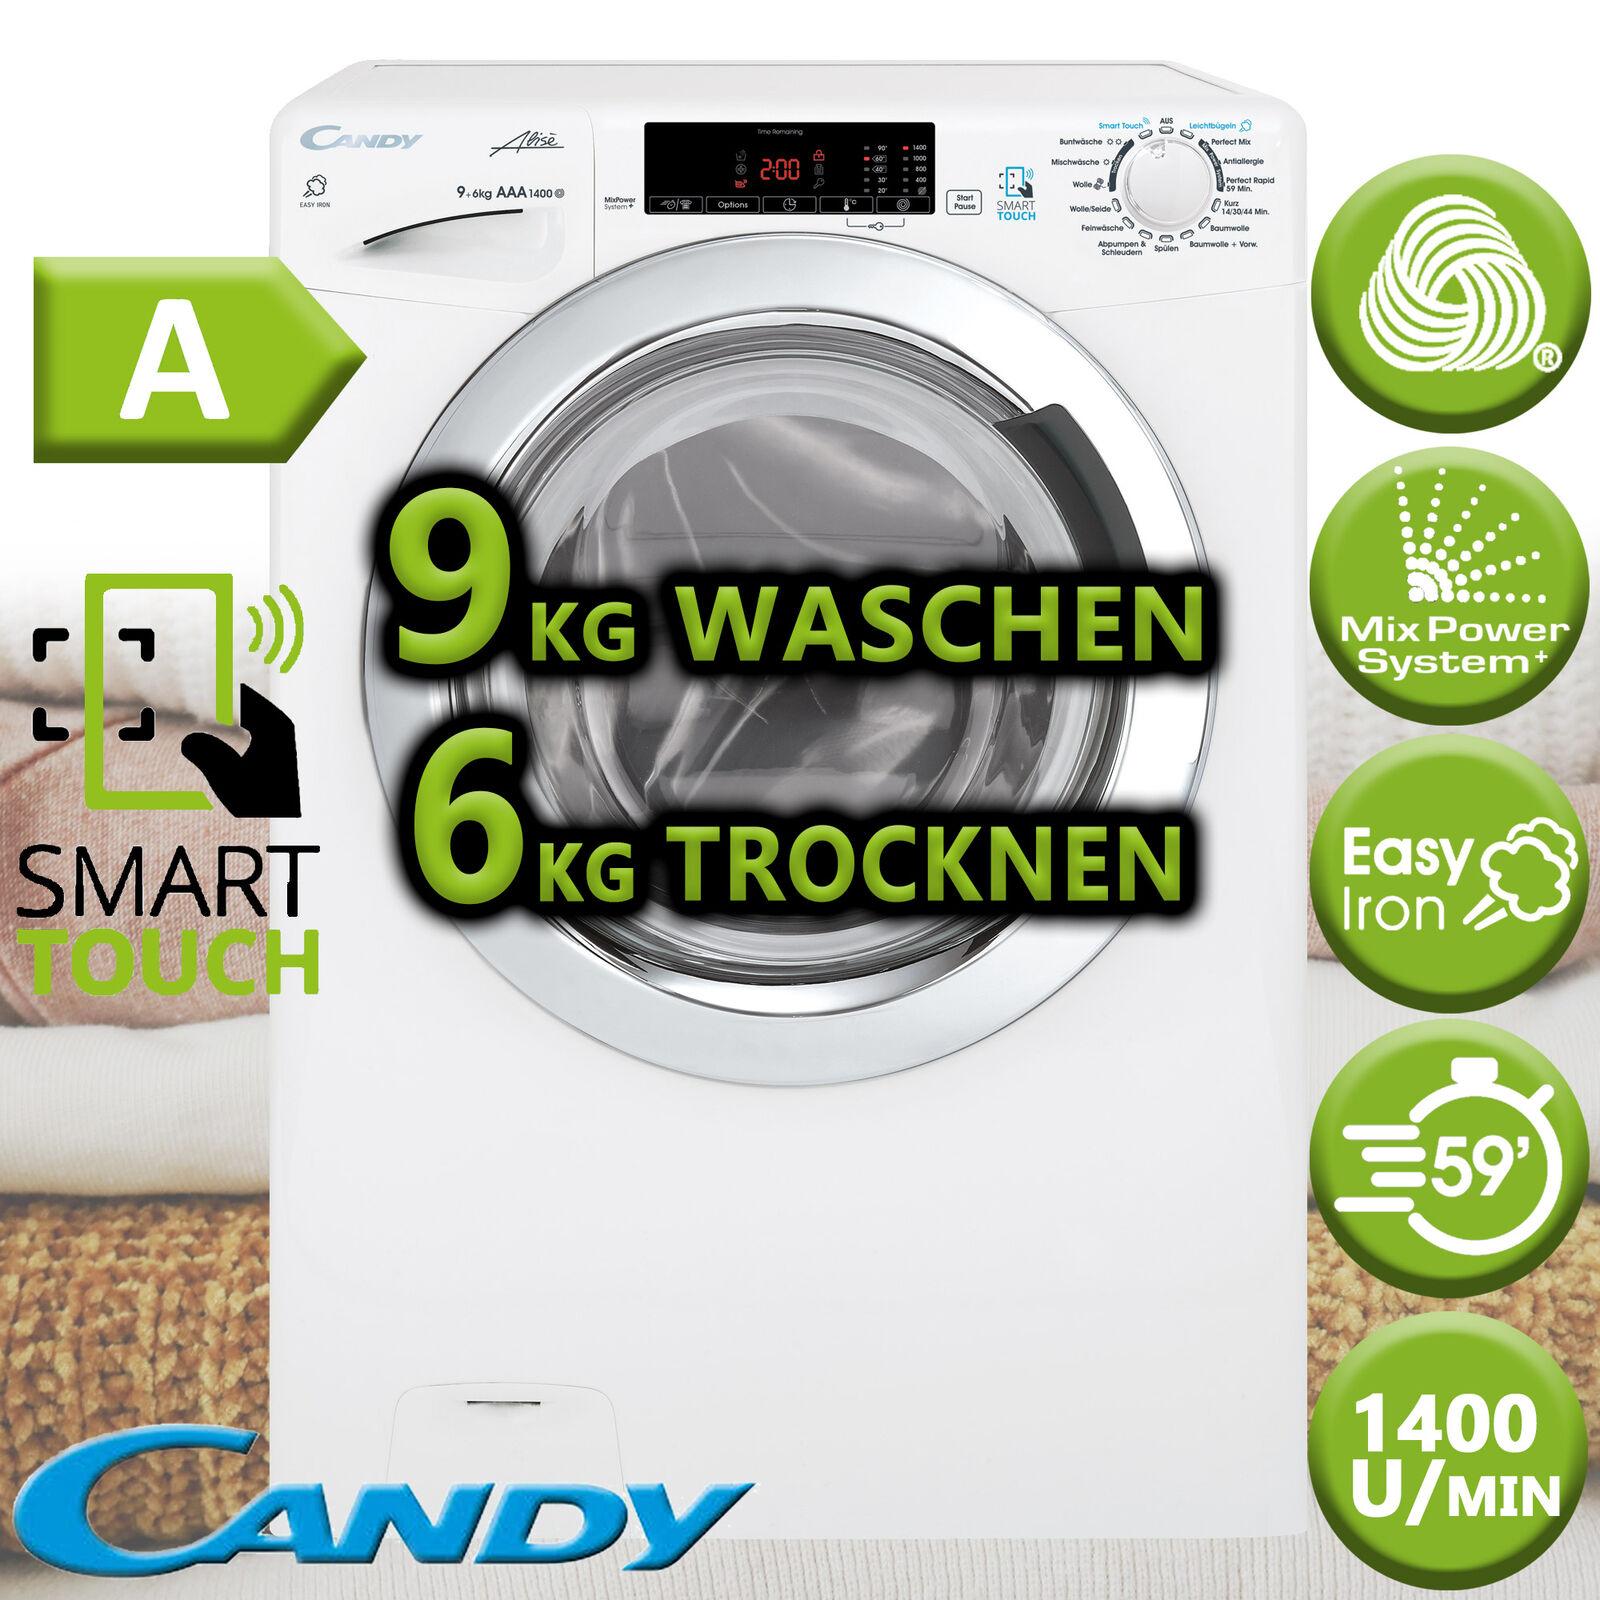 Waschtrockner Waschmaschine Wäschetrockner Trockner 9+6kg Dampf NFC Candy Hoover